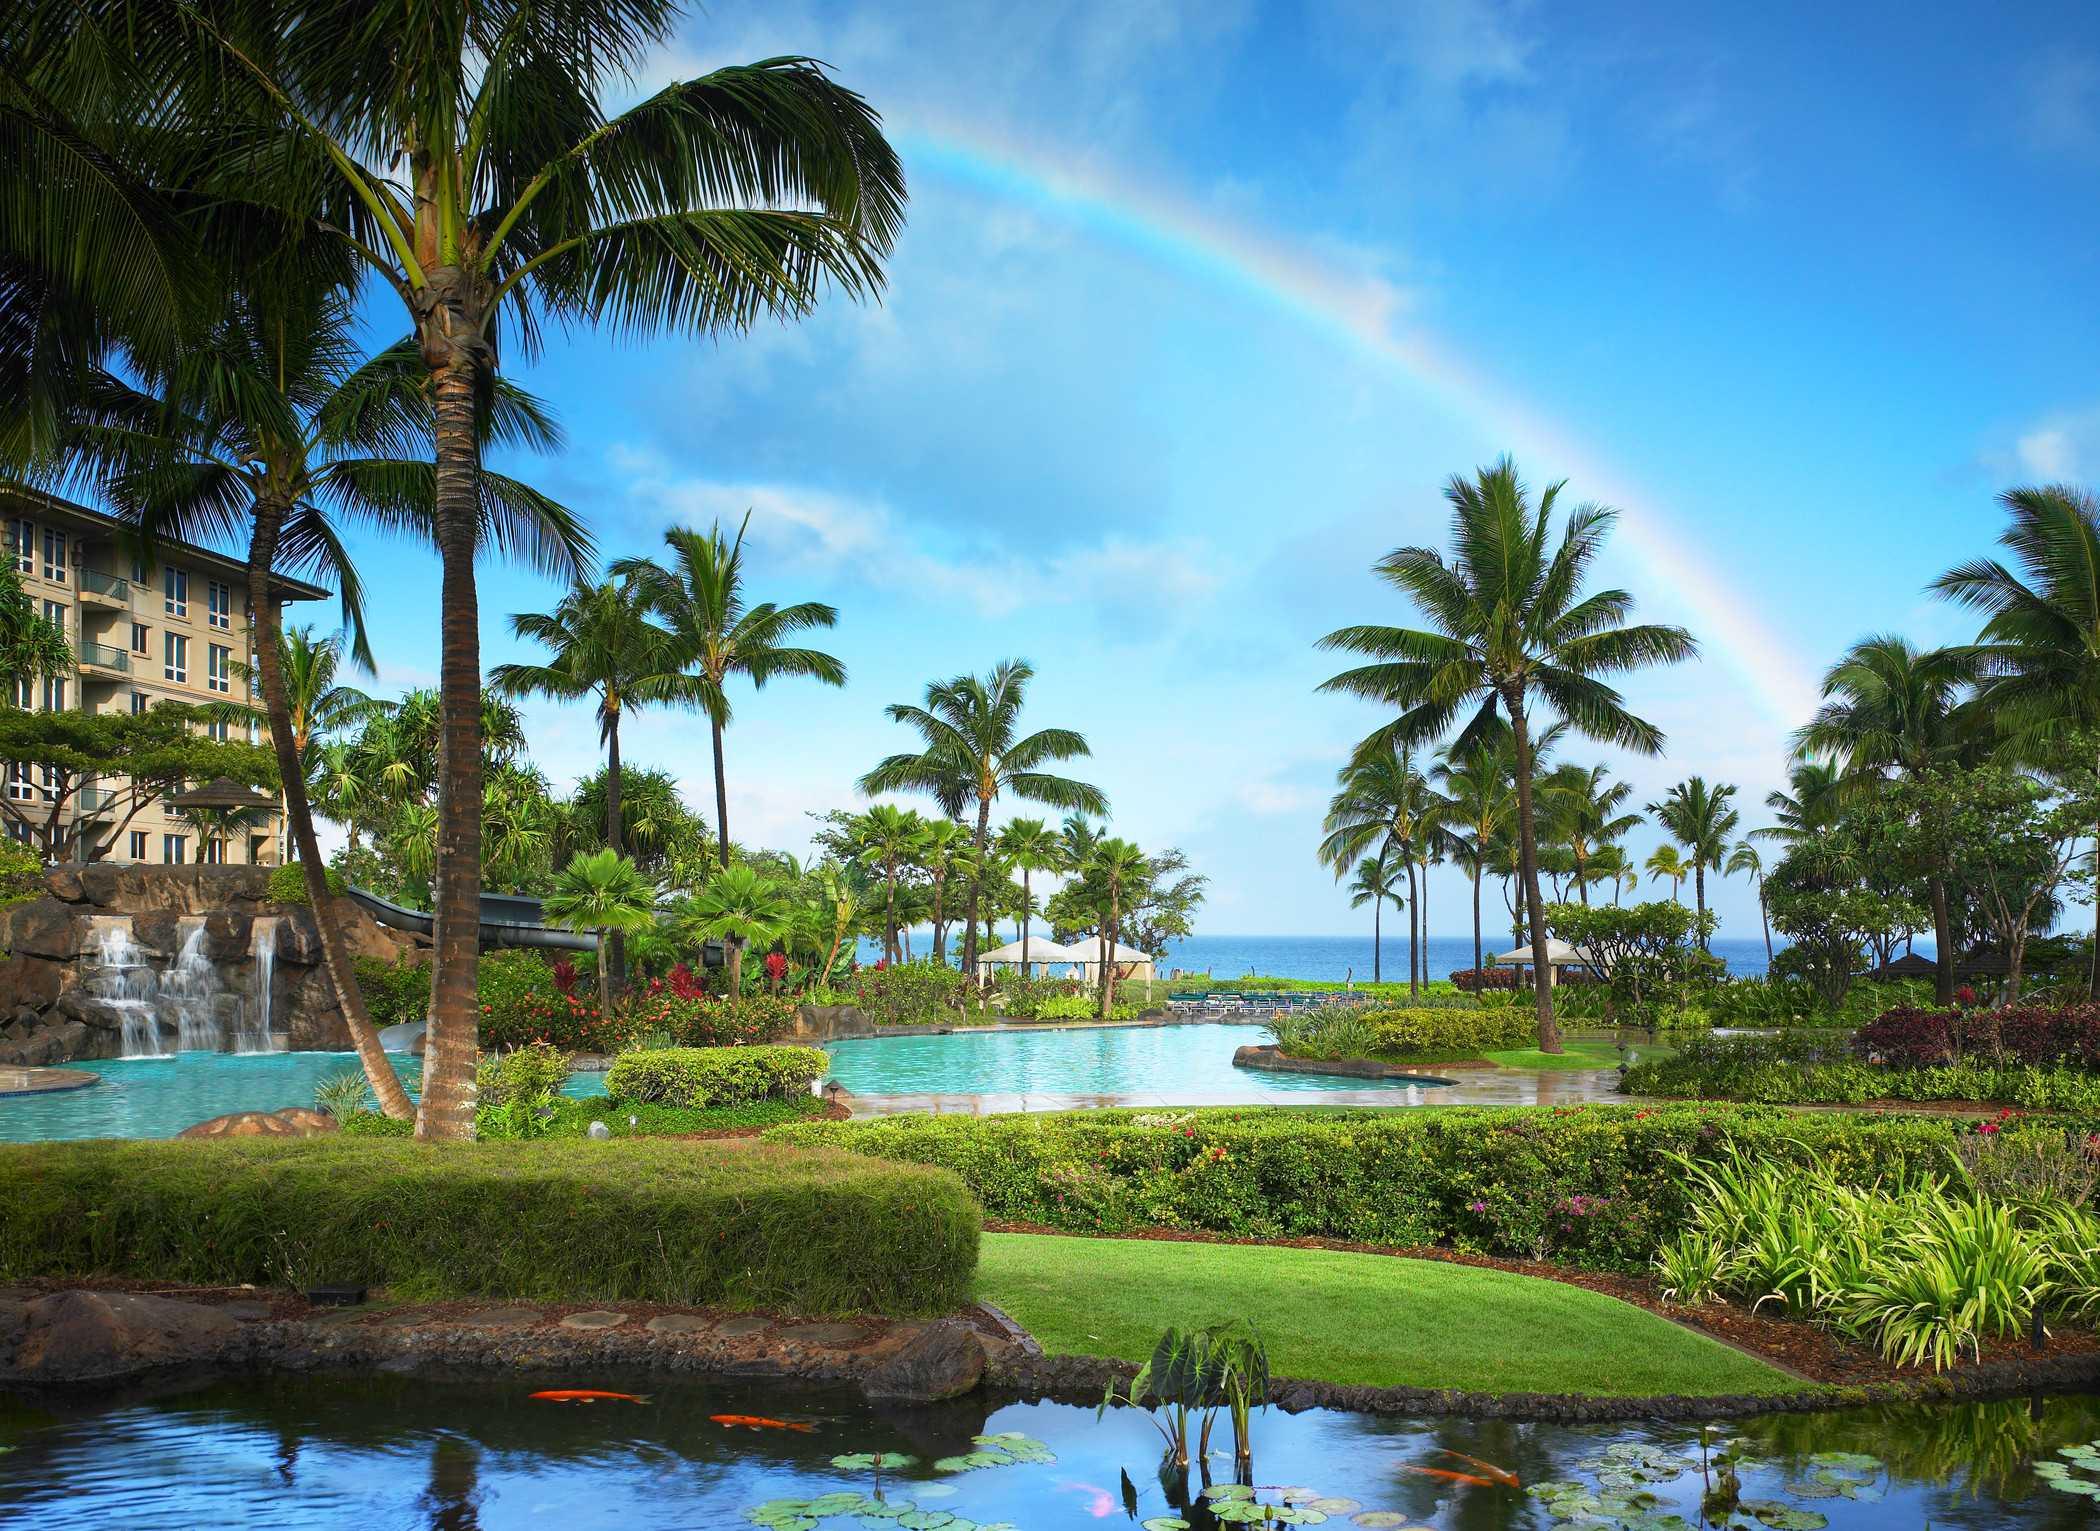 Westin Kaanapali Ocean Resort Celebrates May Day